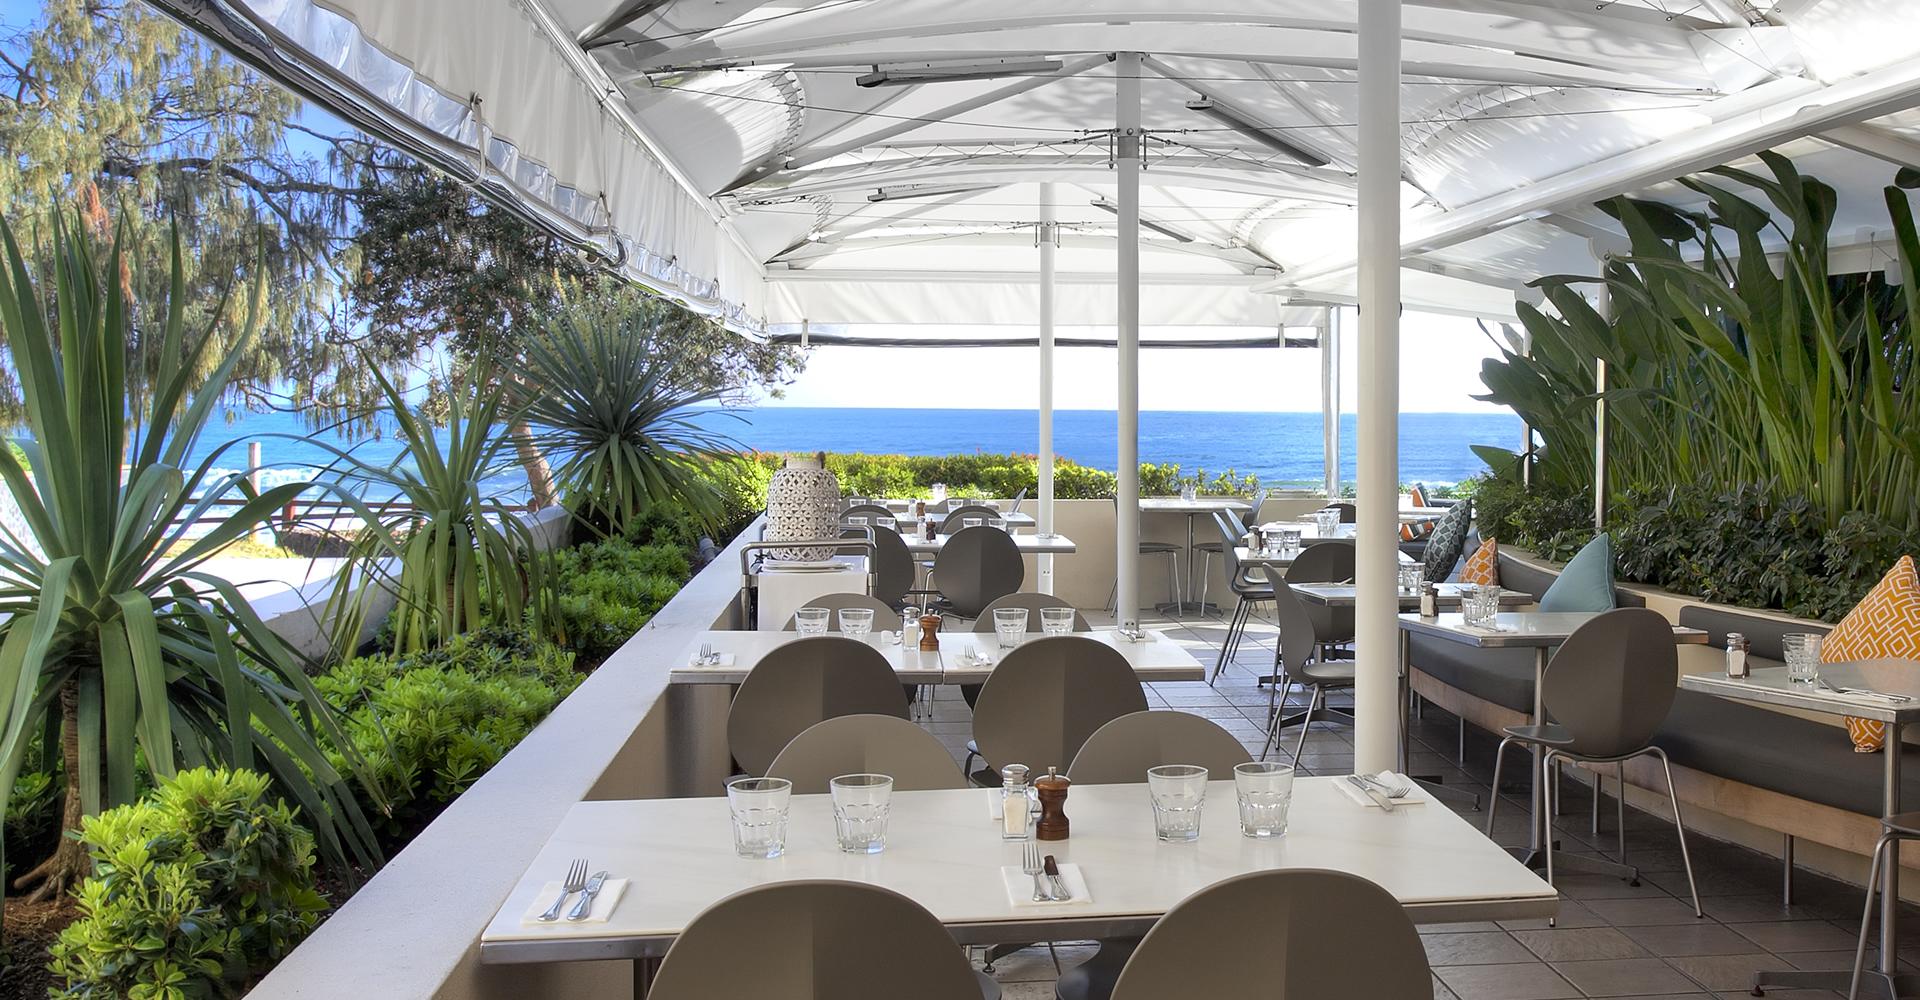 Noosa-Beachfront-Restaurant-Contact-Us-Slide